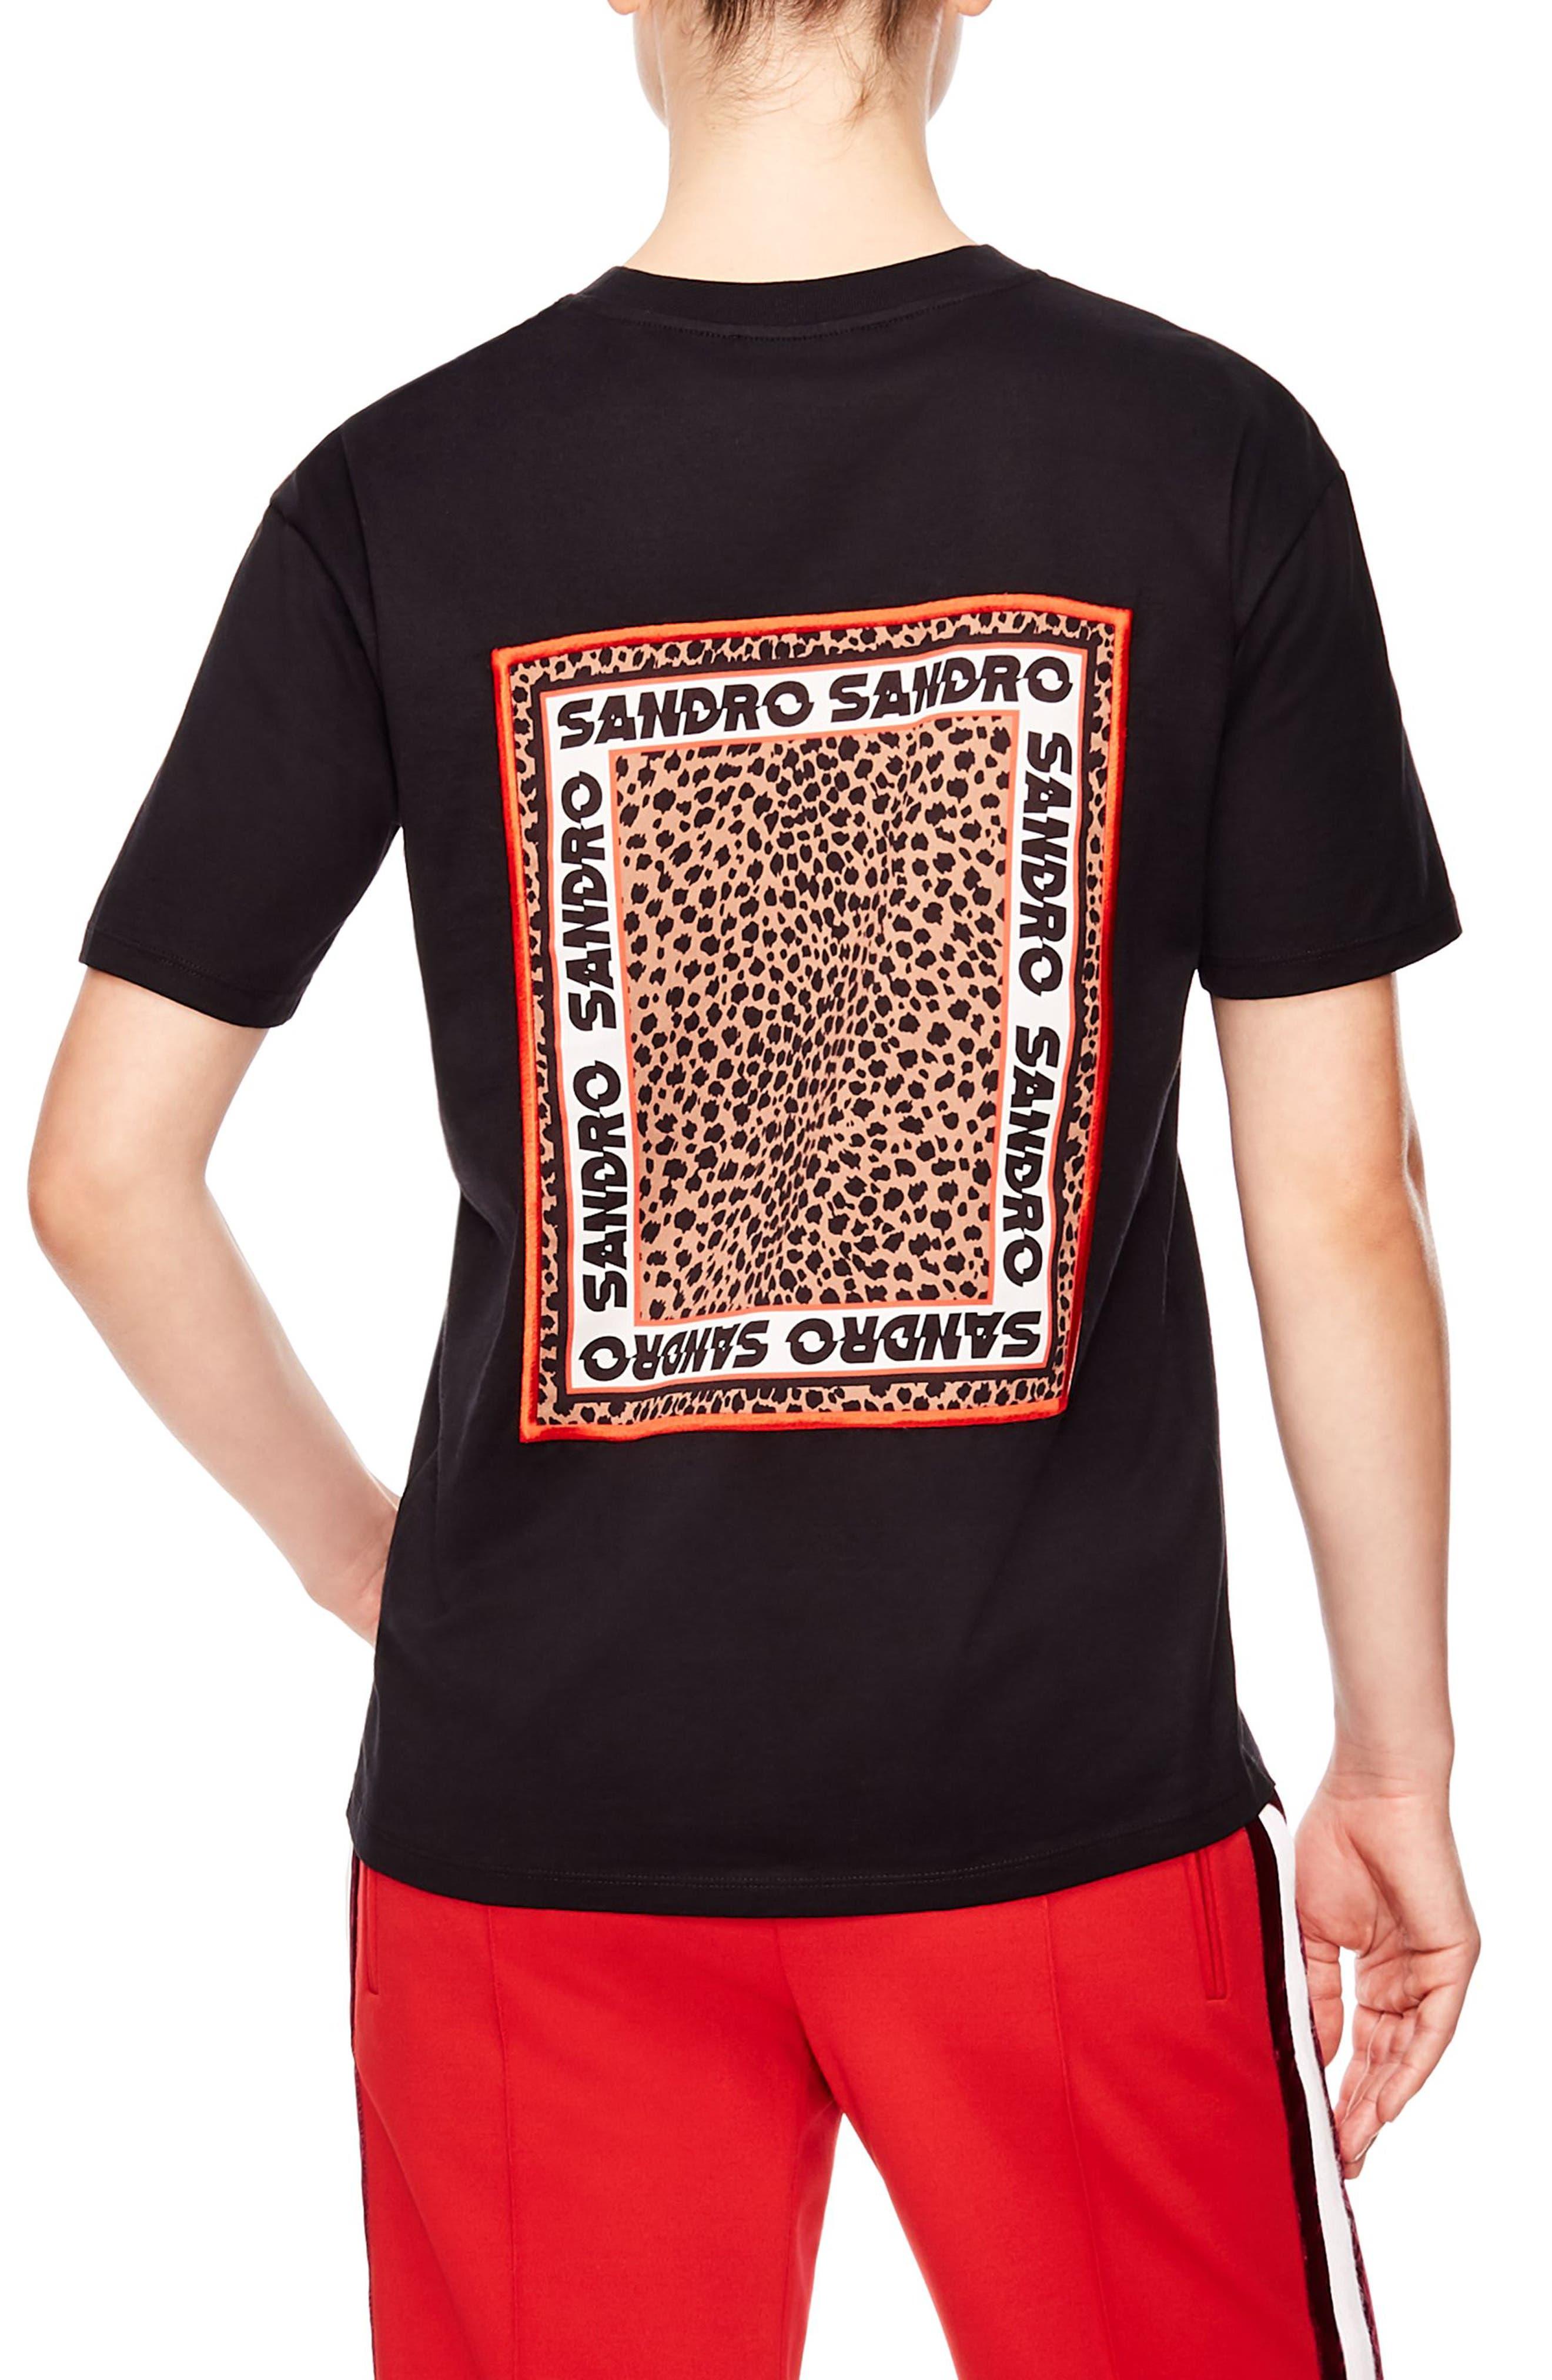 SANDRO,                             Logo Tee,                             Alternate thumbnail 2, color,                             001